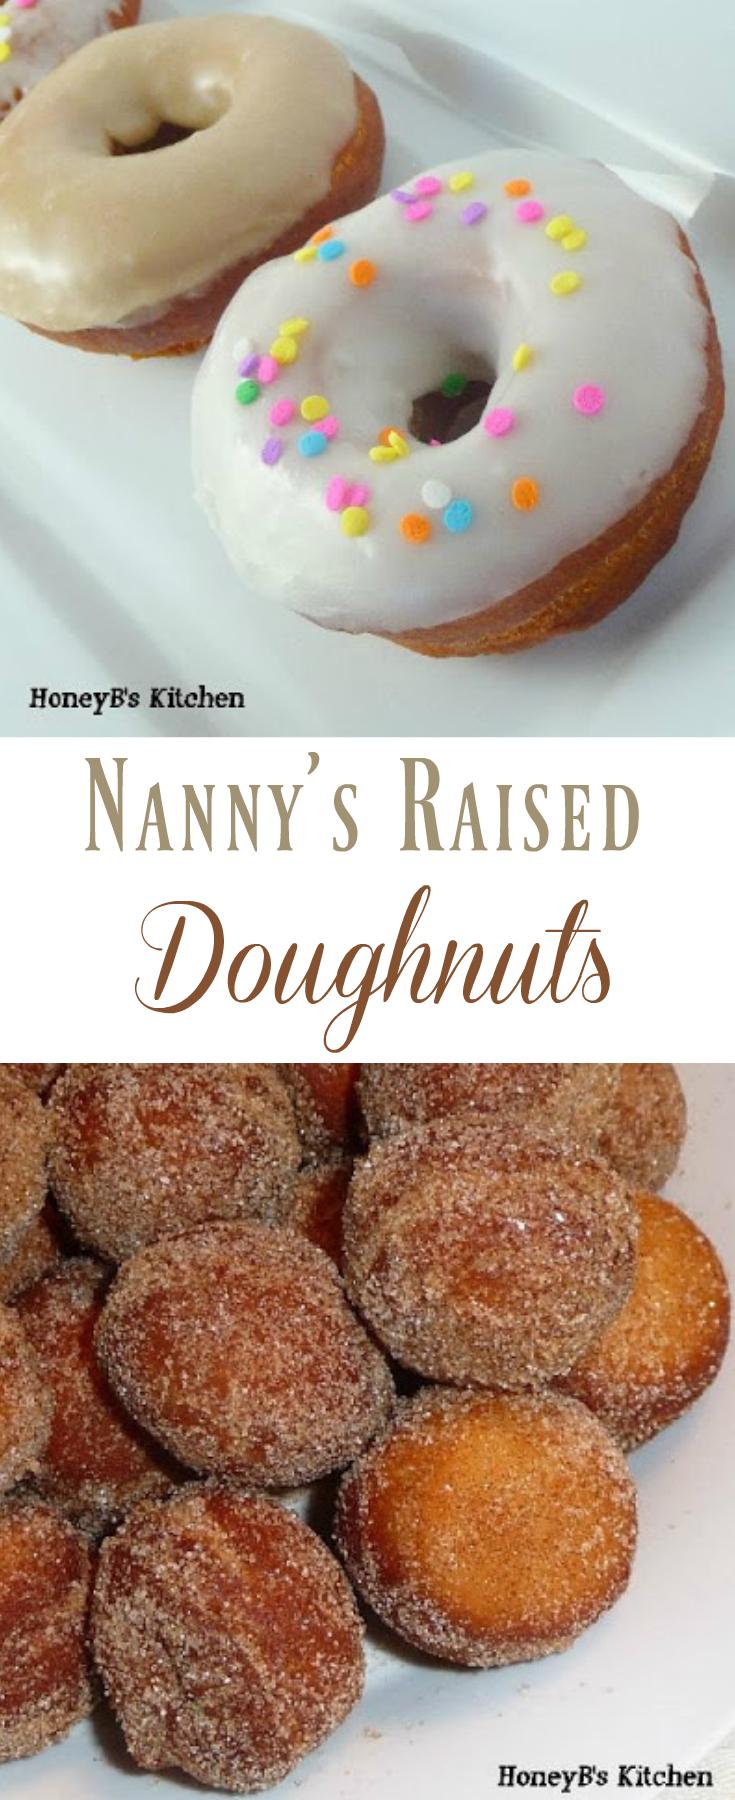 Nanny's Raised Doughnuts